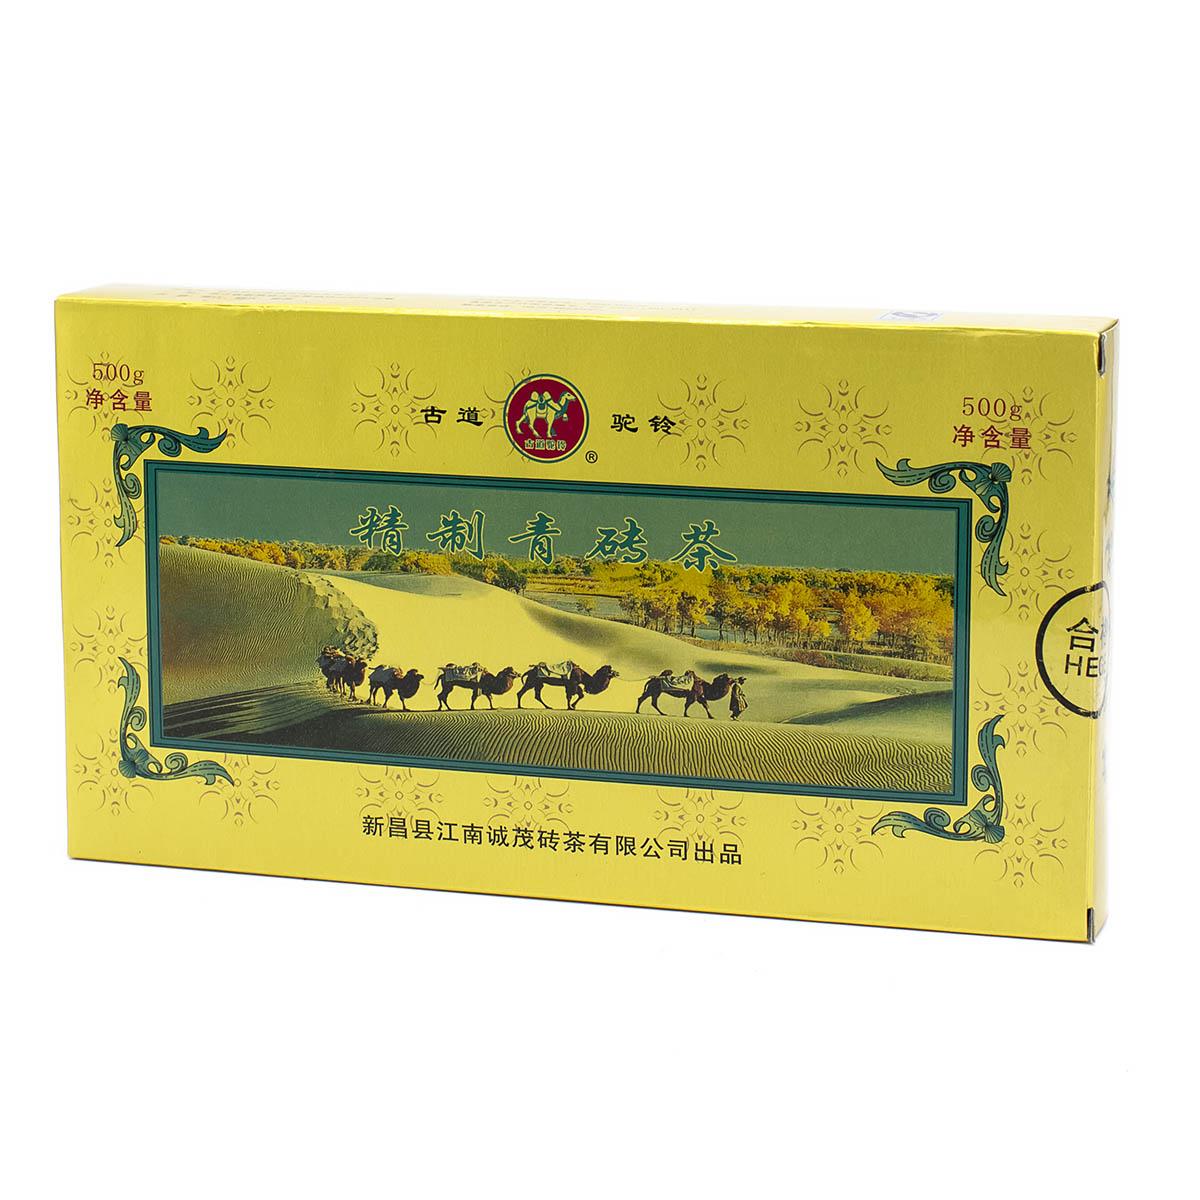 цены Чай черный Цзин Чжи Цин Ча Чжуань Золотой Верблюд, 2013, кирпич, 500 г